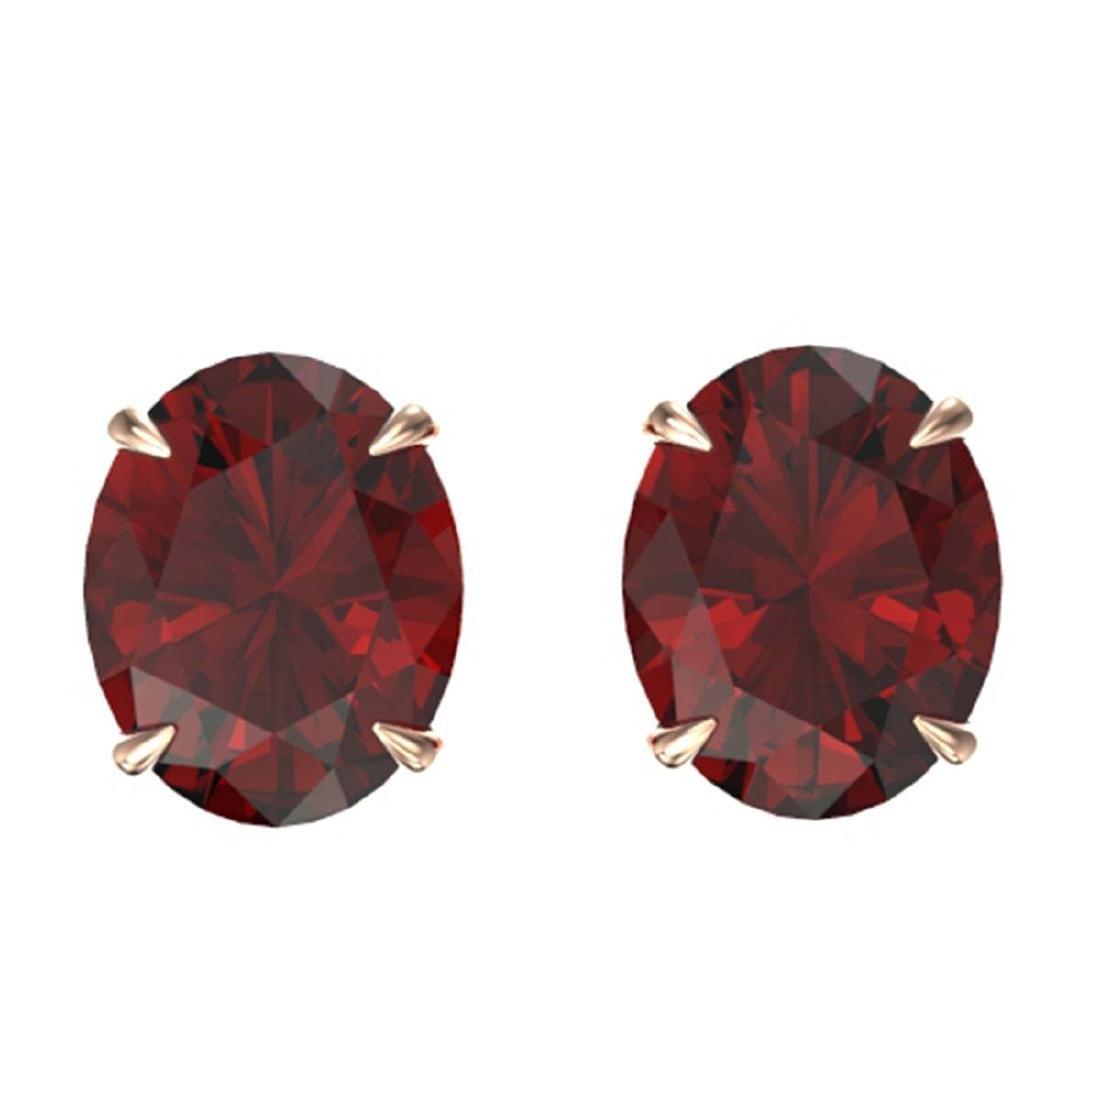 7 CTW Genuine Garnet Stud Earrings 14K Rose Gold